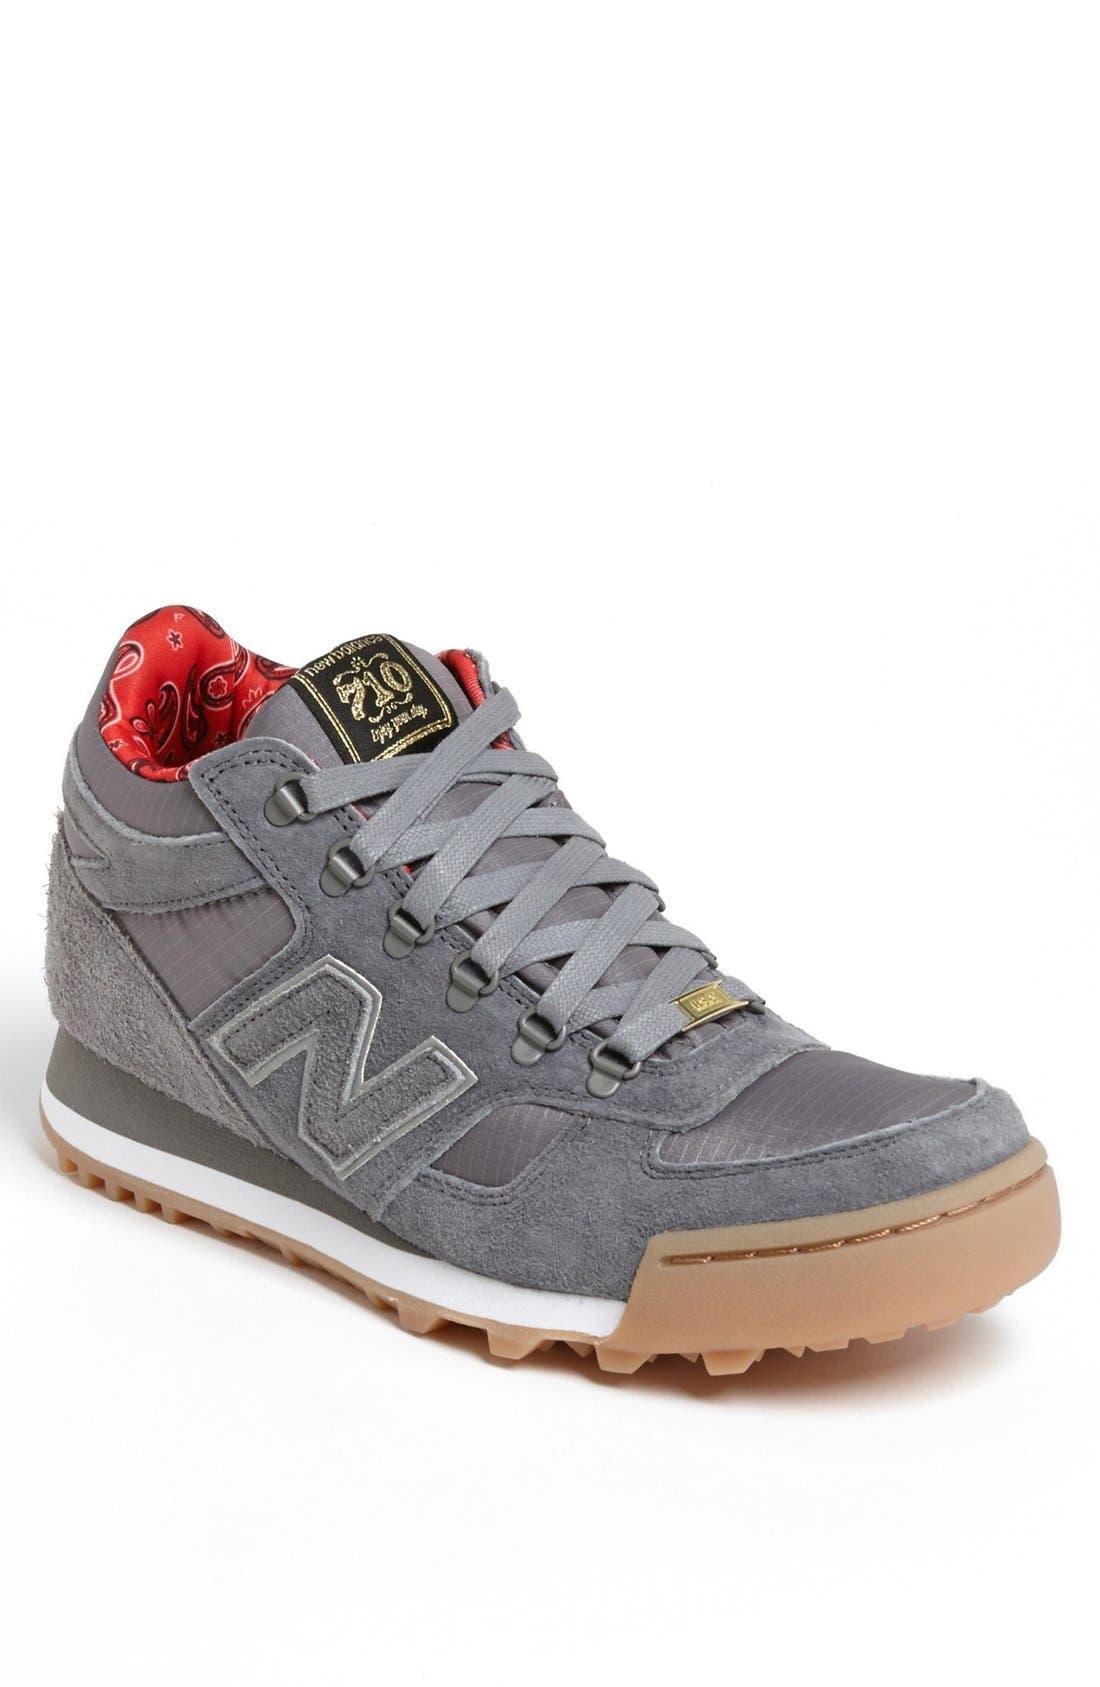 Main Image - New Balance 'Herschel Supply Co. - 710' Sneaker (Men)